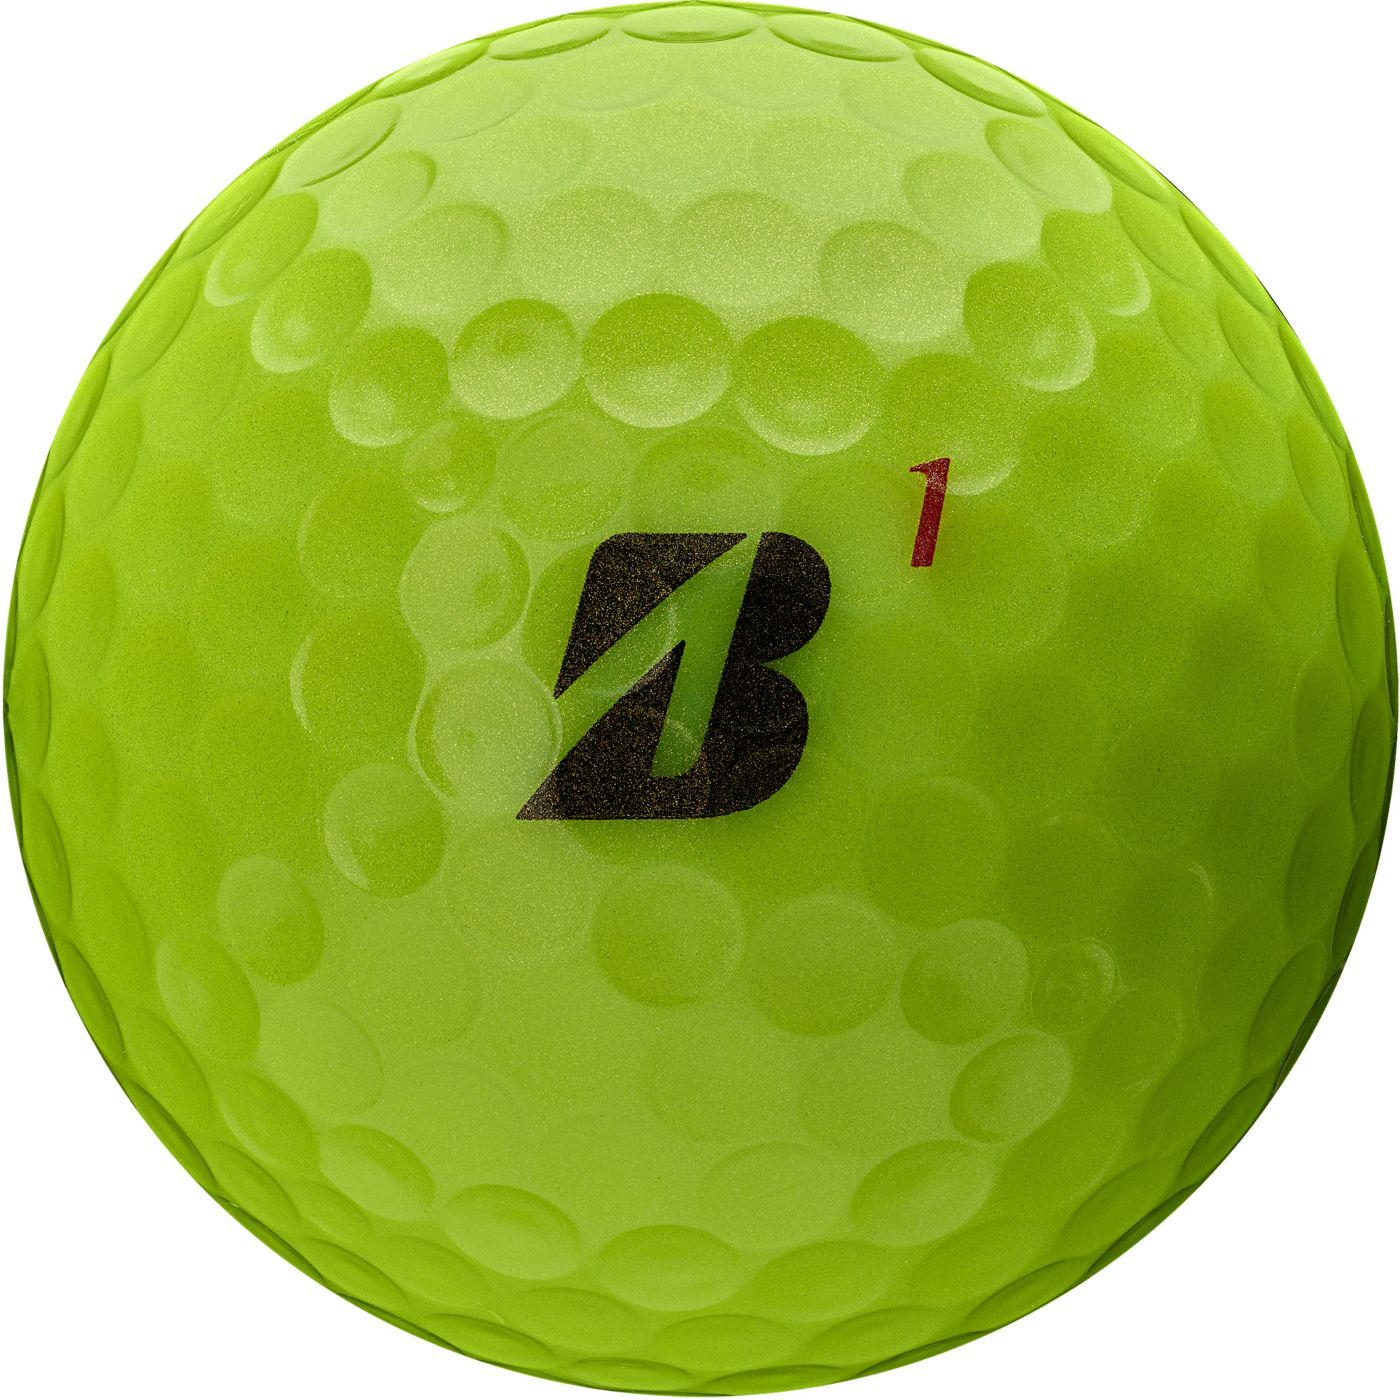 Bridgestone 2020 TOUR B RX Optic Yellow Golf Balls